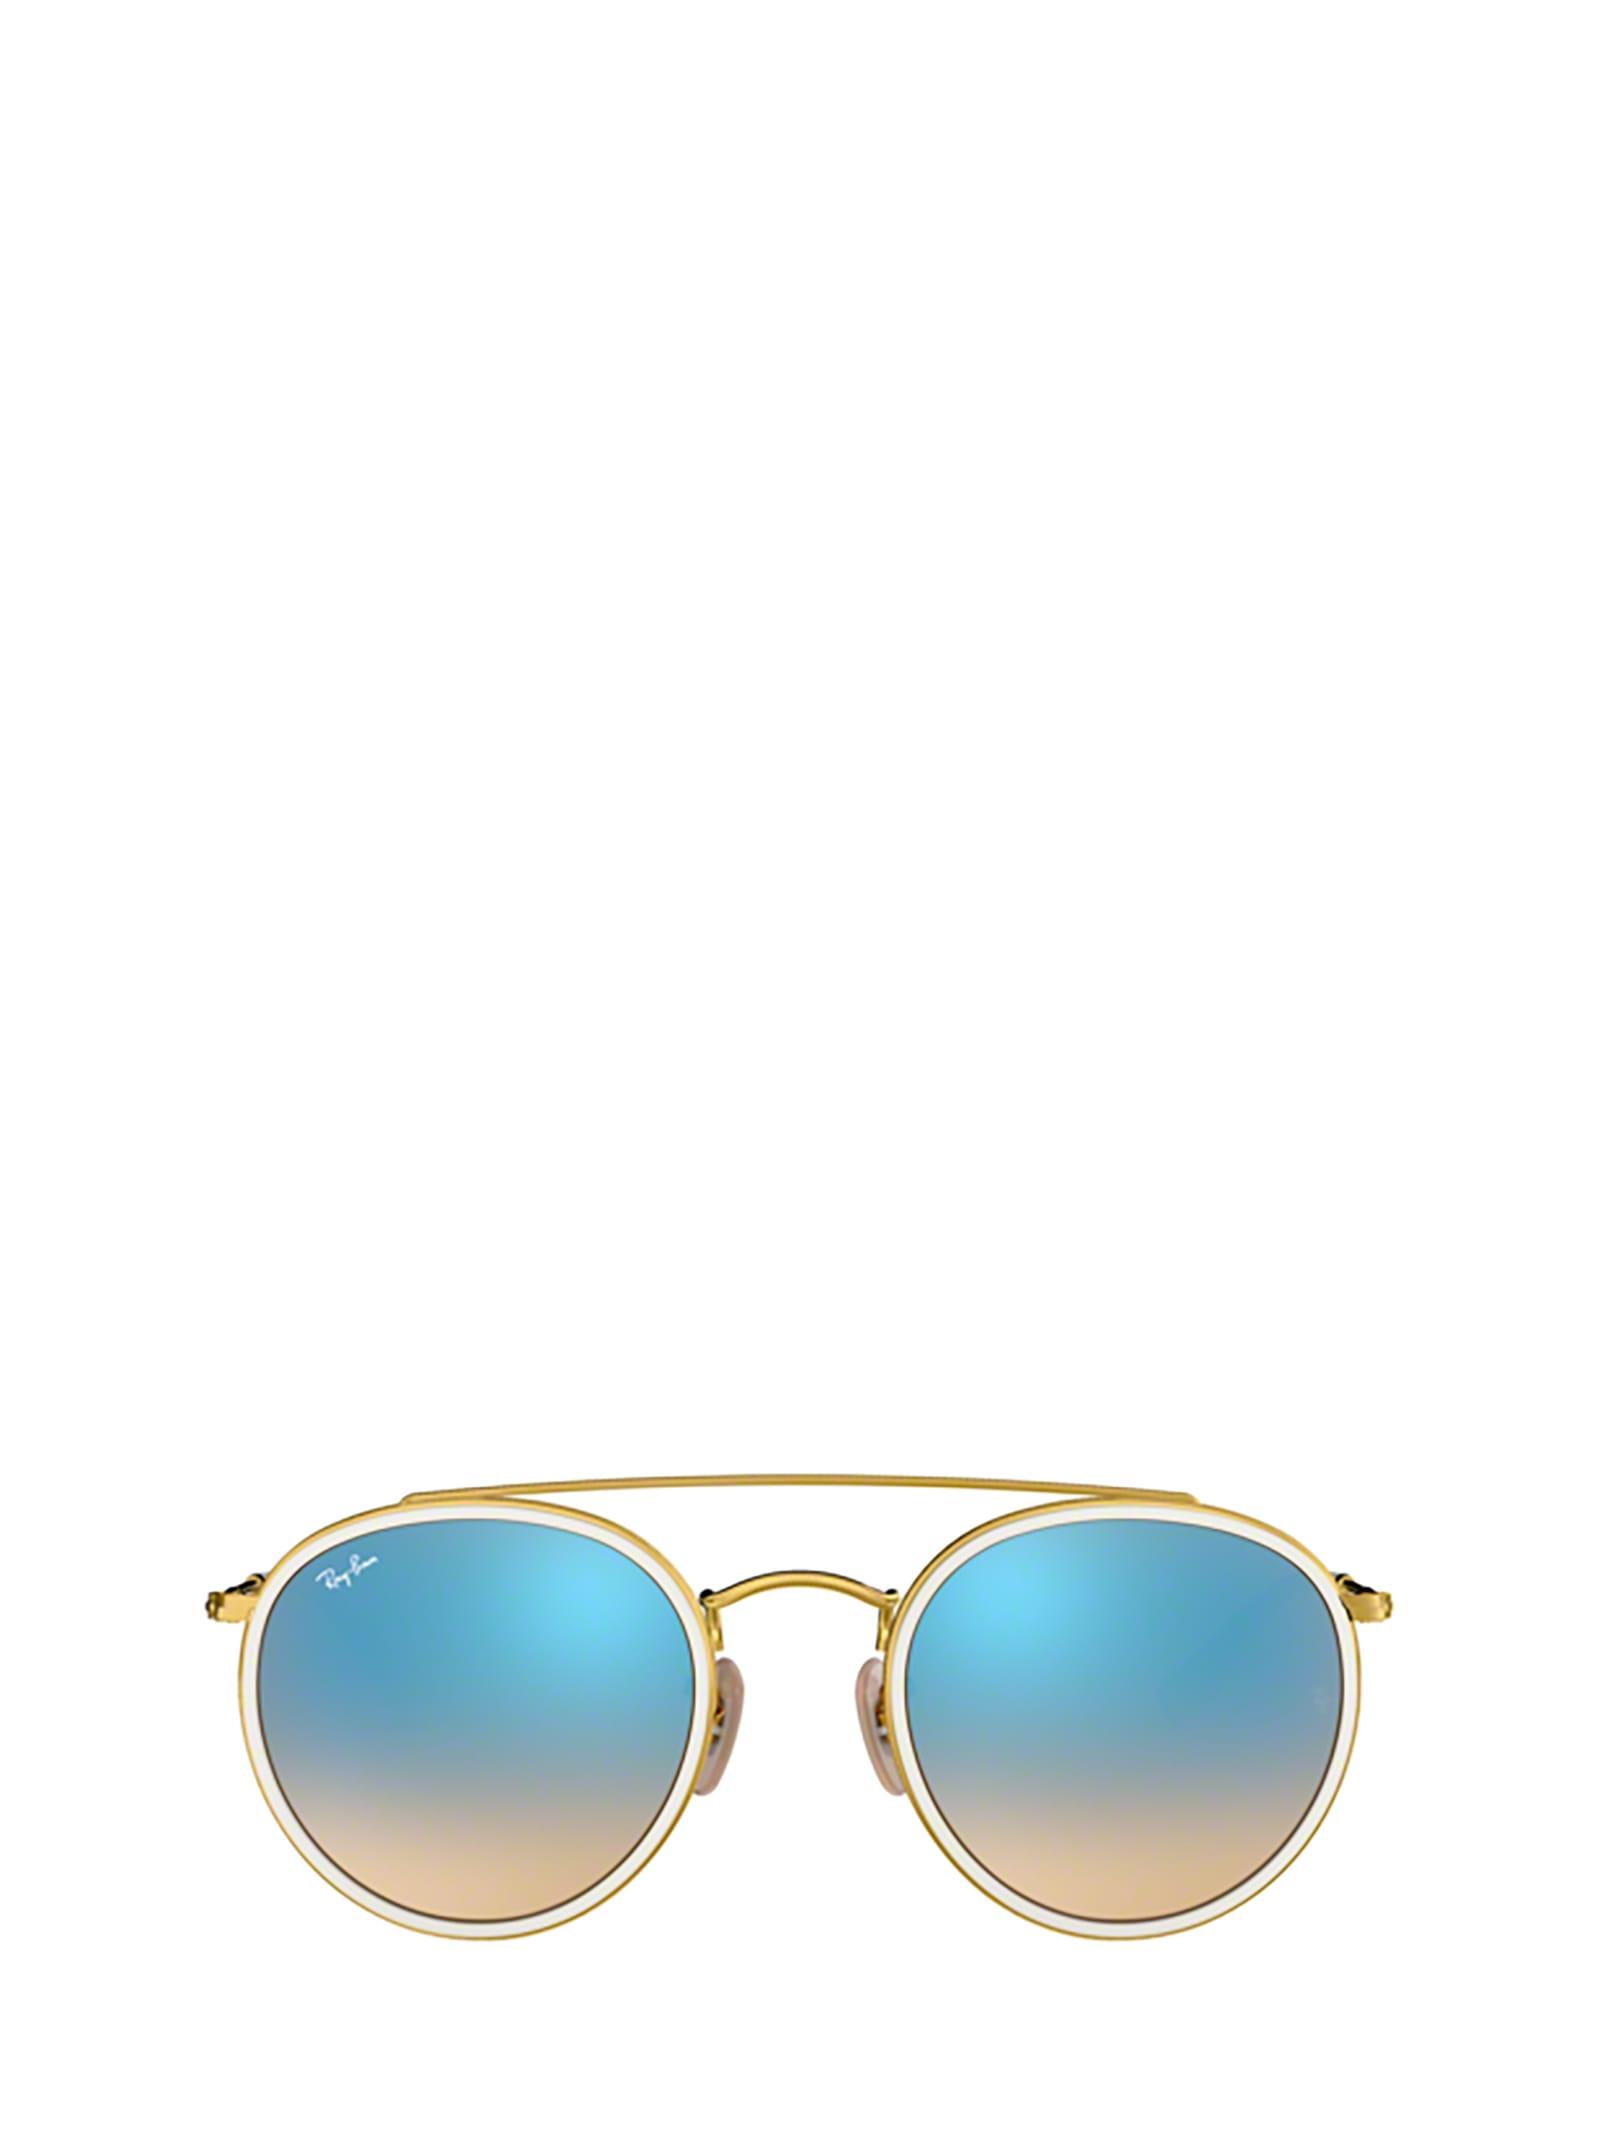 Ray-Ban Ray-ban Rb3647n Arista Sunglasses